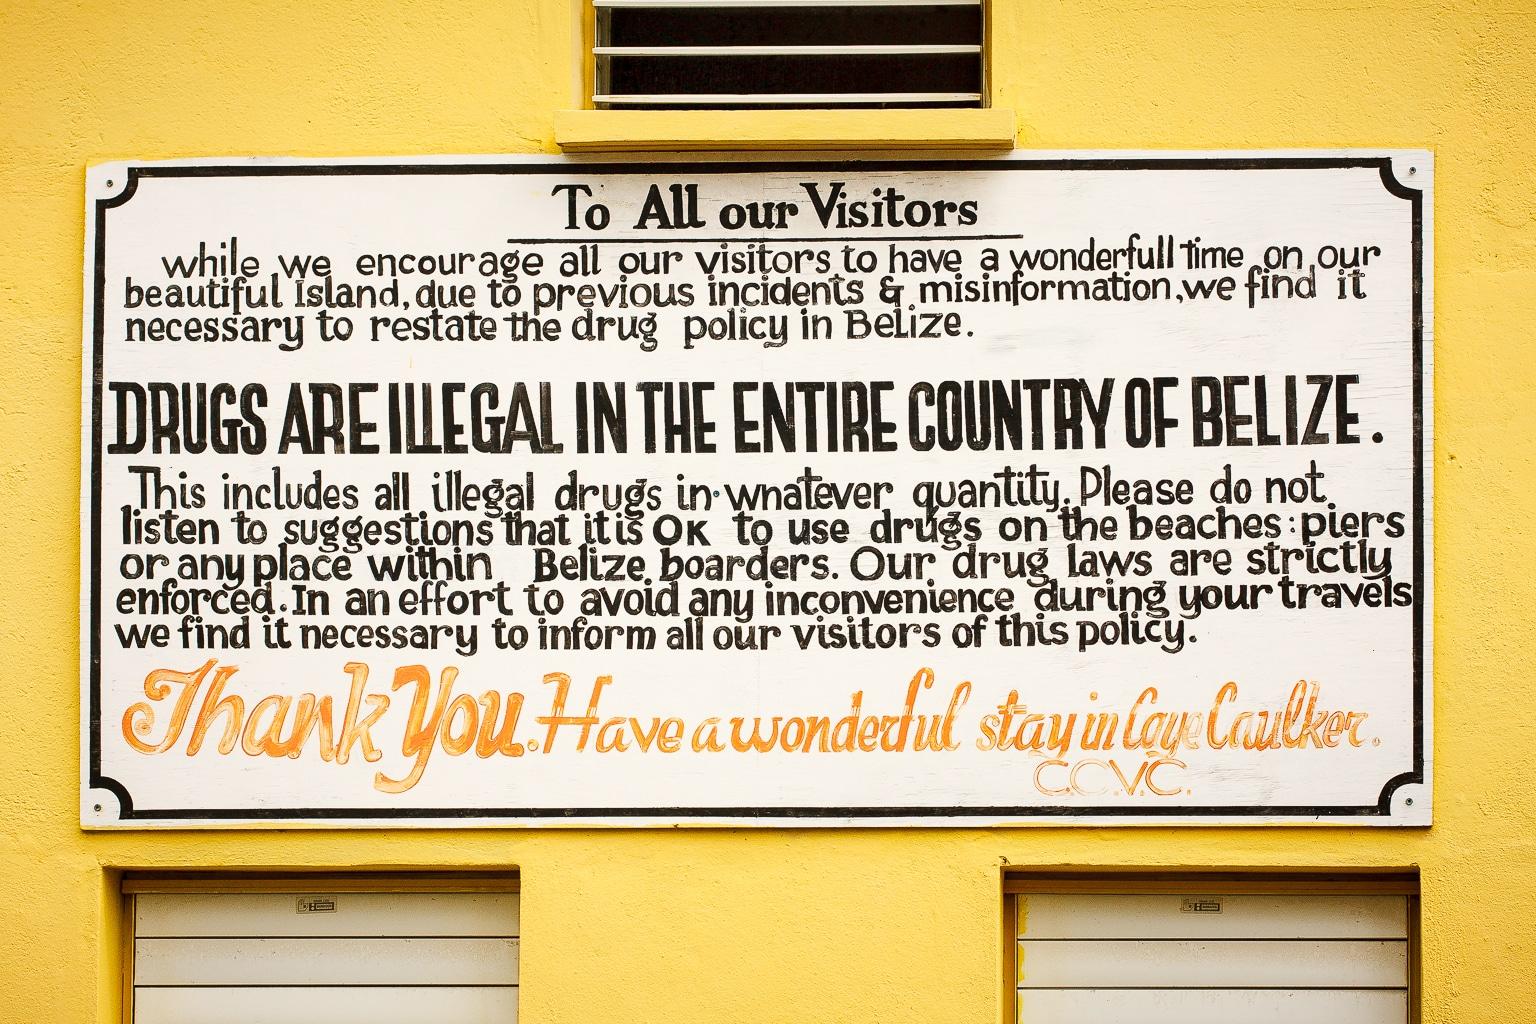 Rules on Caye Caulker, Belize